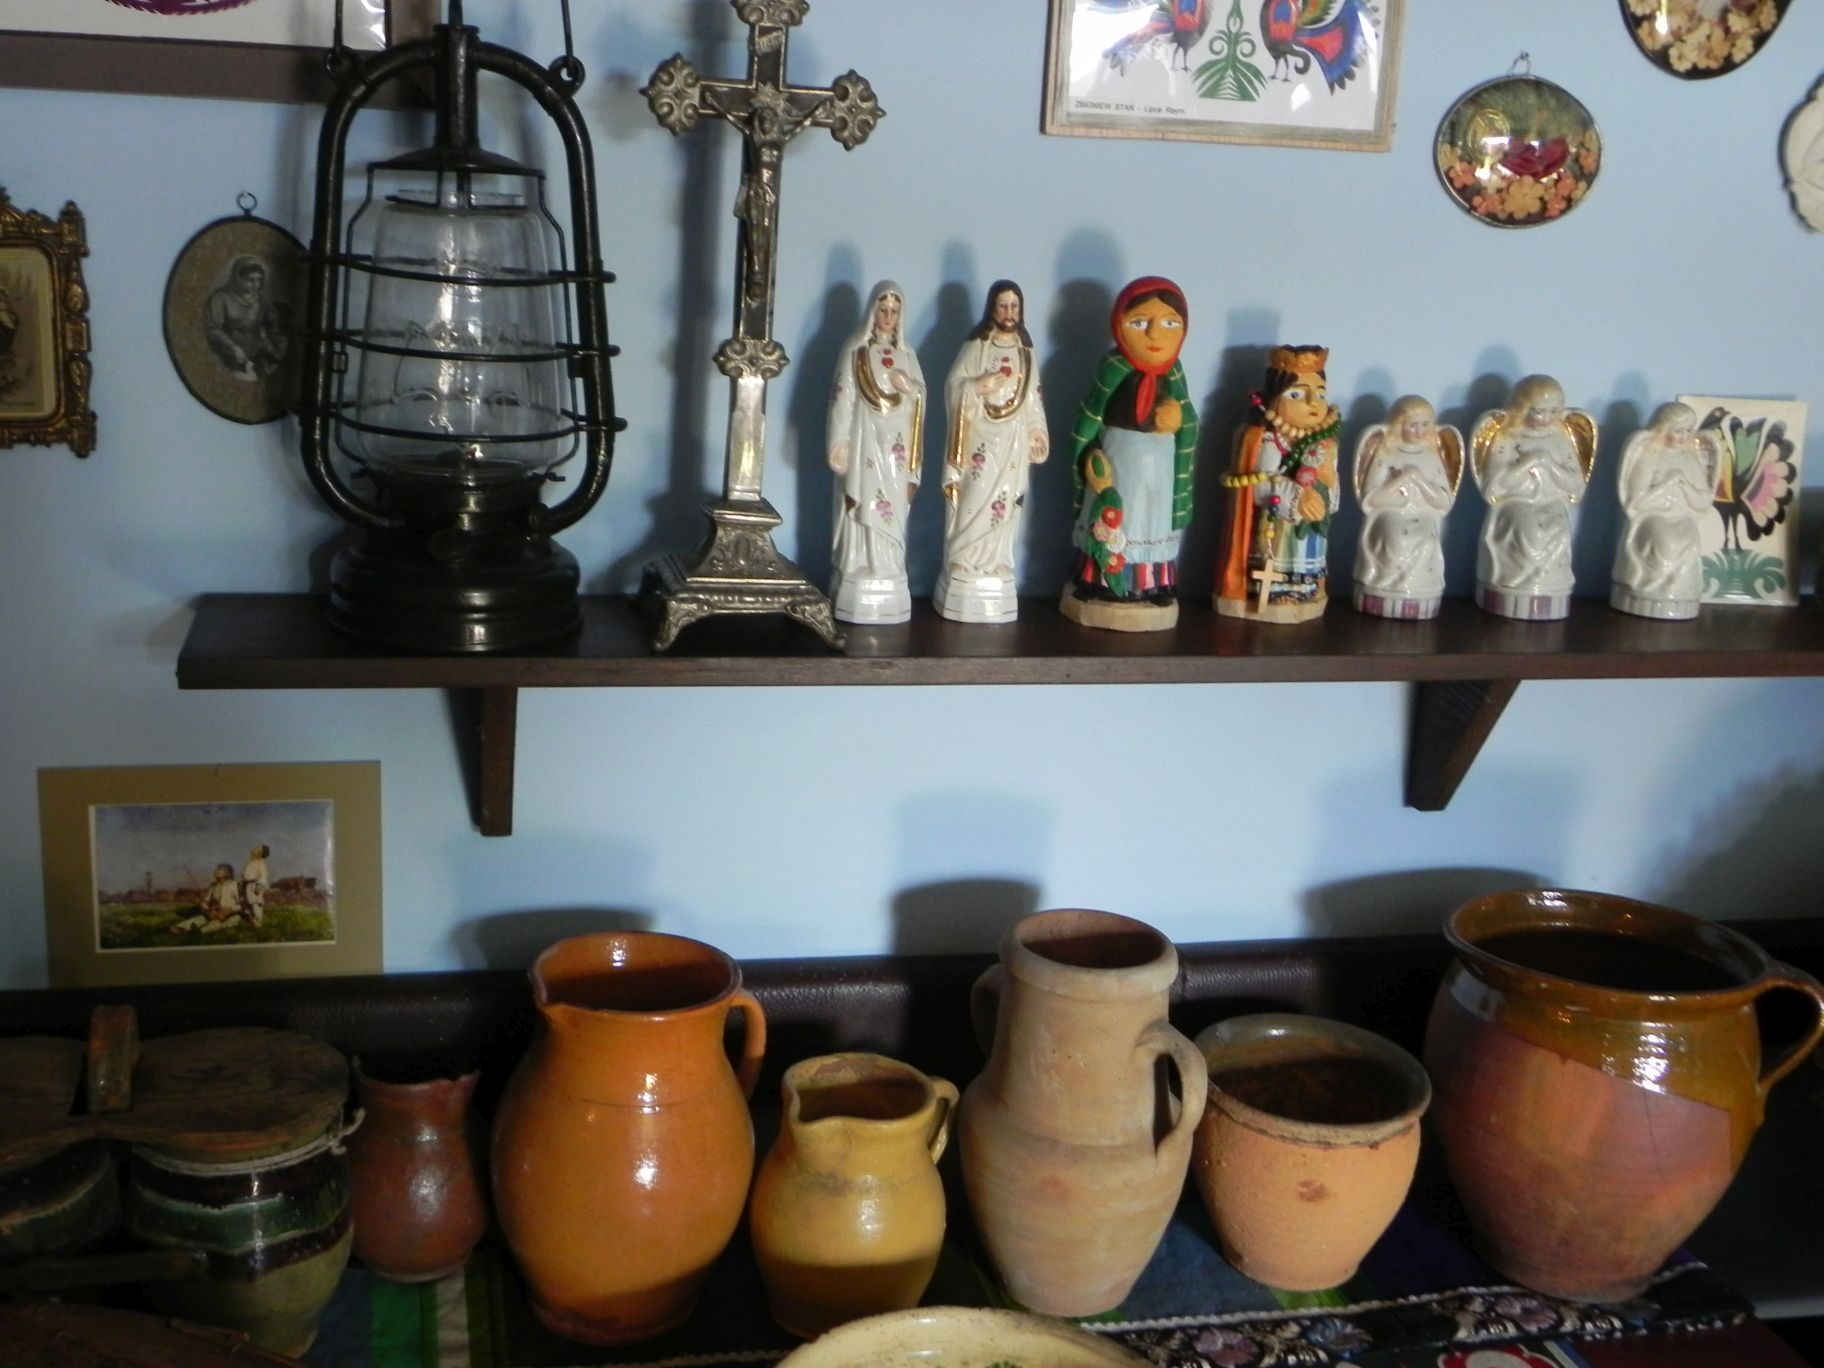 2012-05-03 Lipce Reymontowskie - galeria staroci (11)